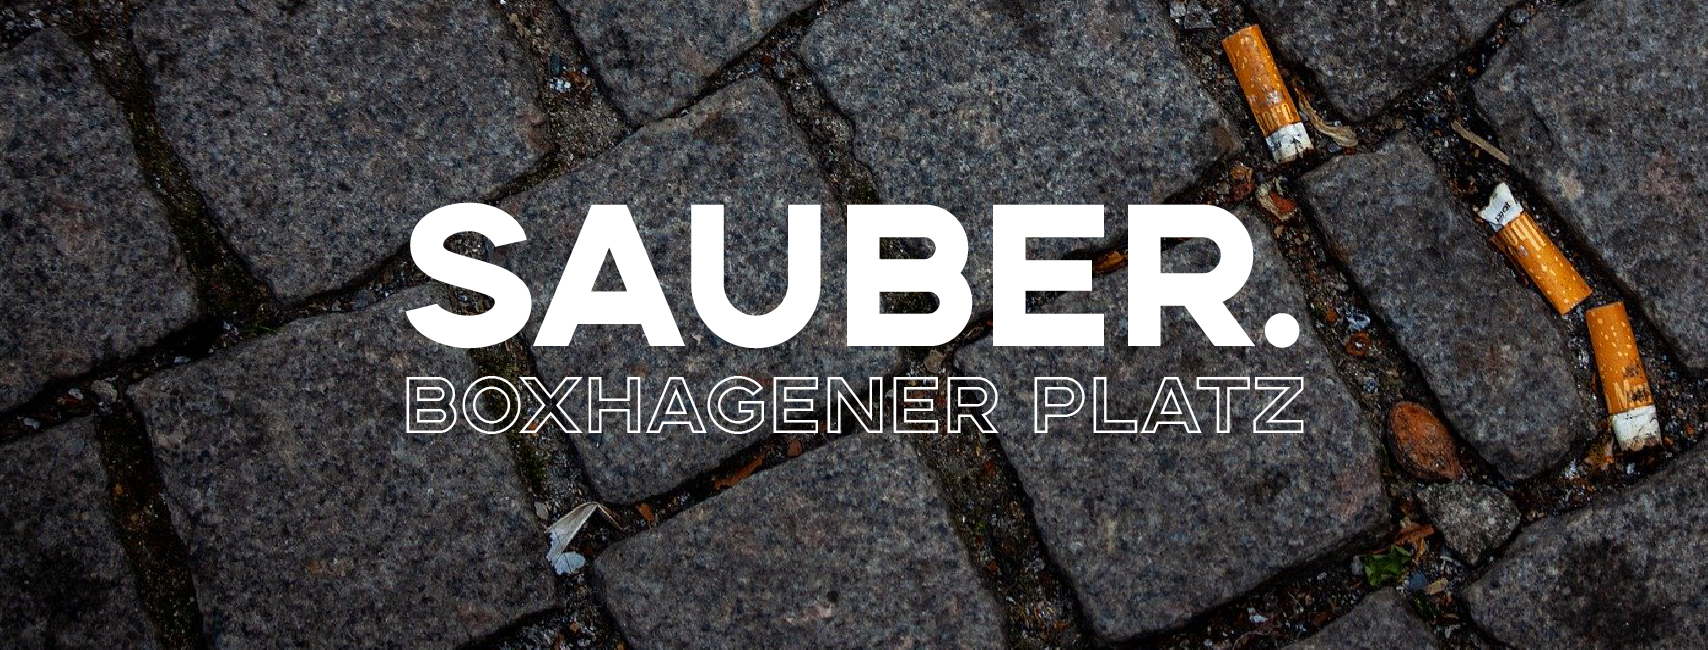 CleanUp | sauber.Boxhagener Platz (Berlin)